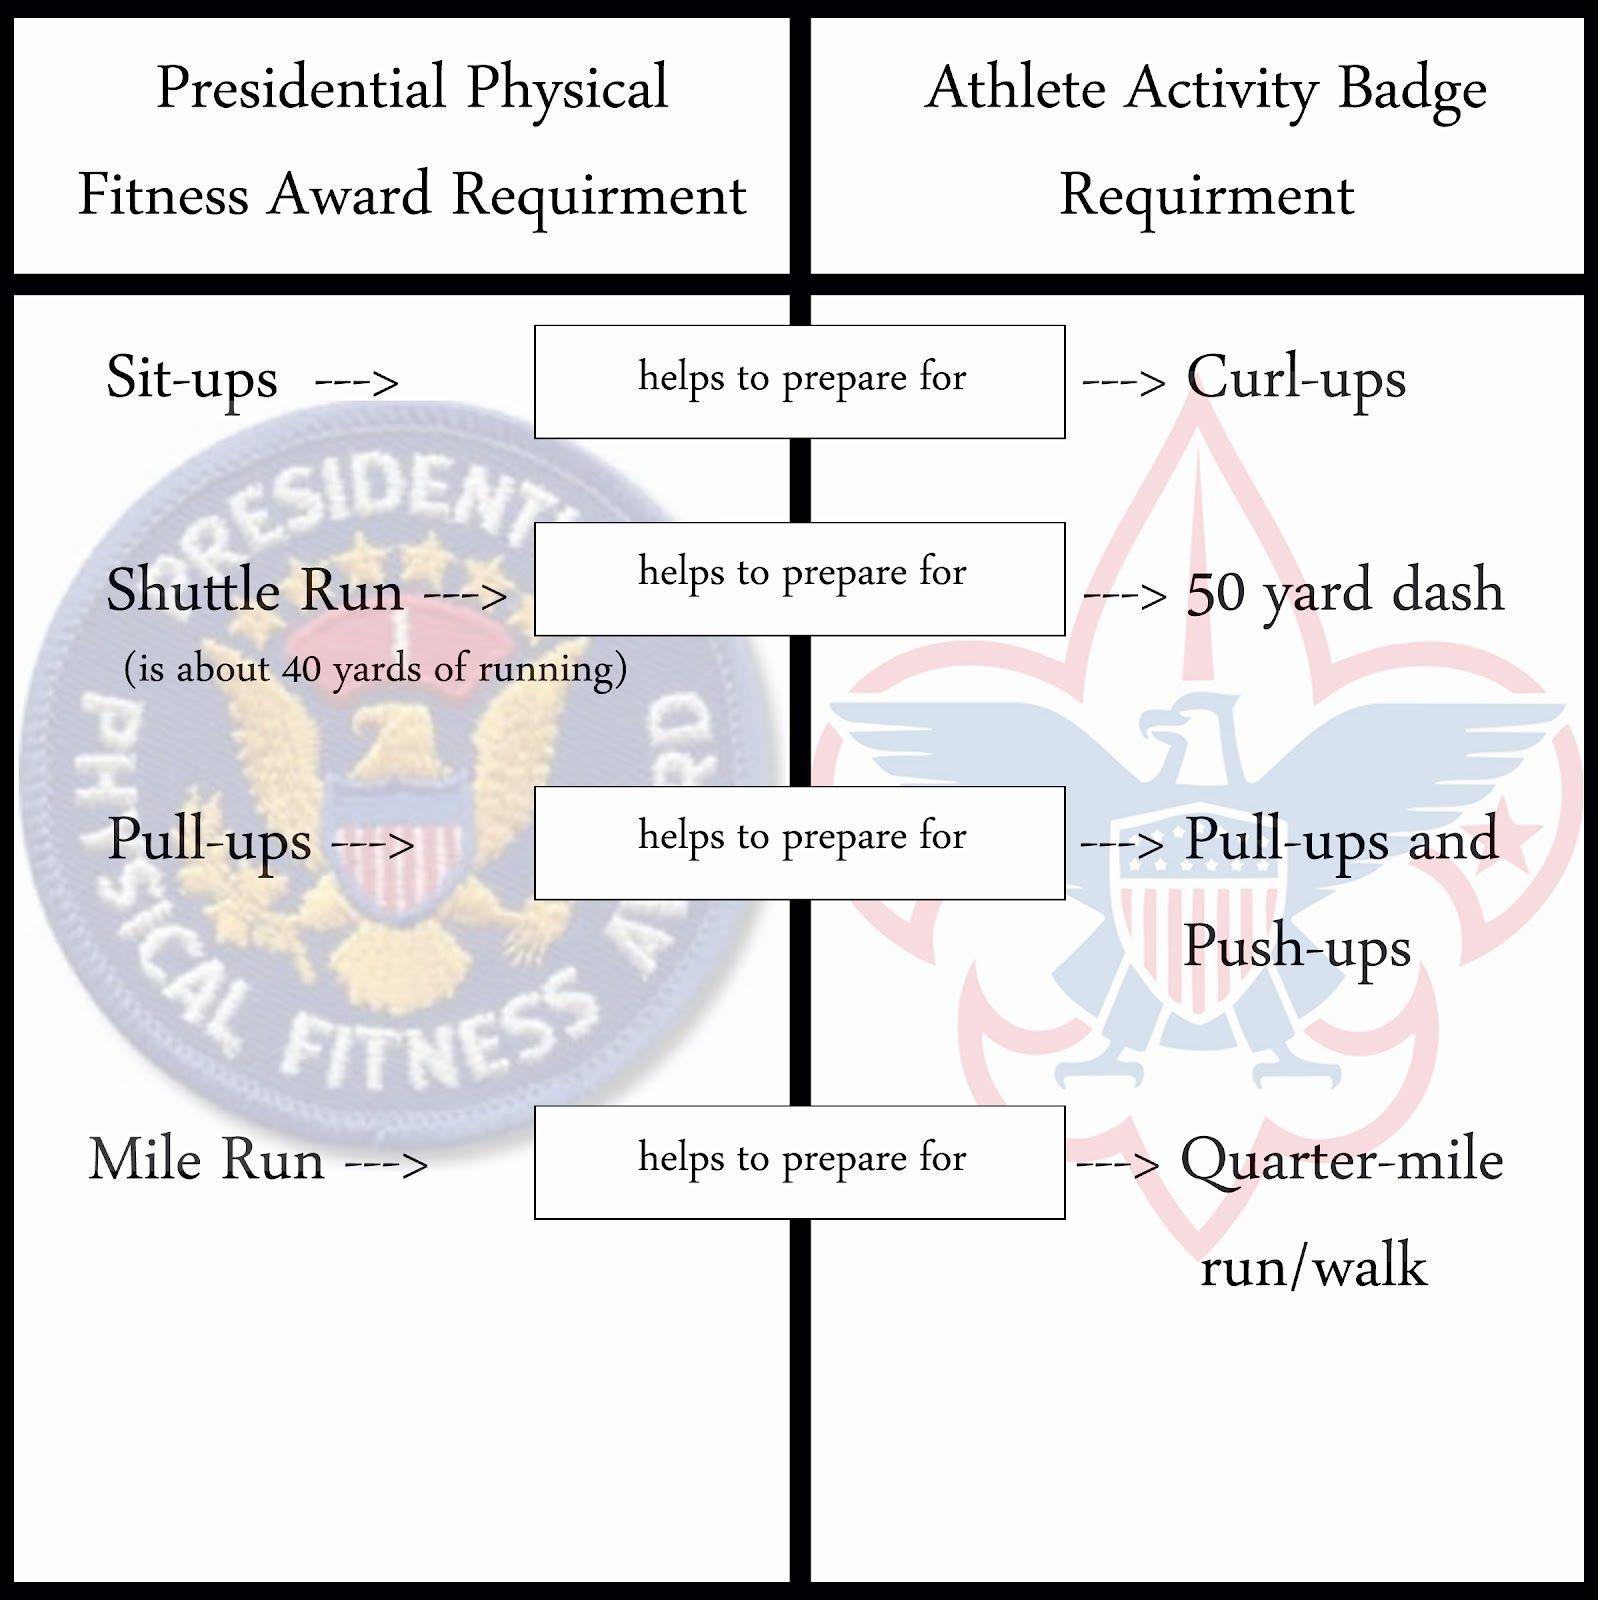 Athlete Activity Badge